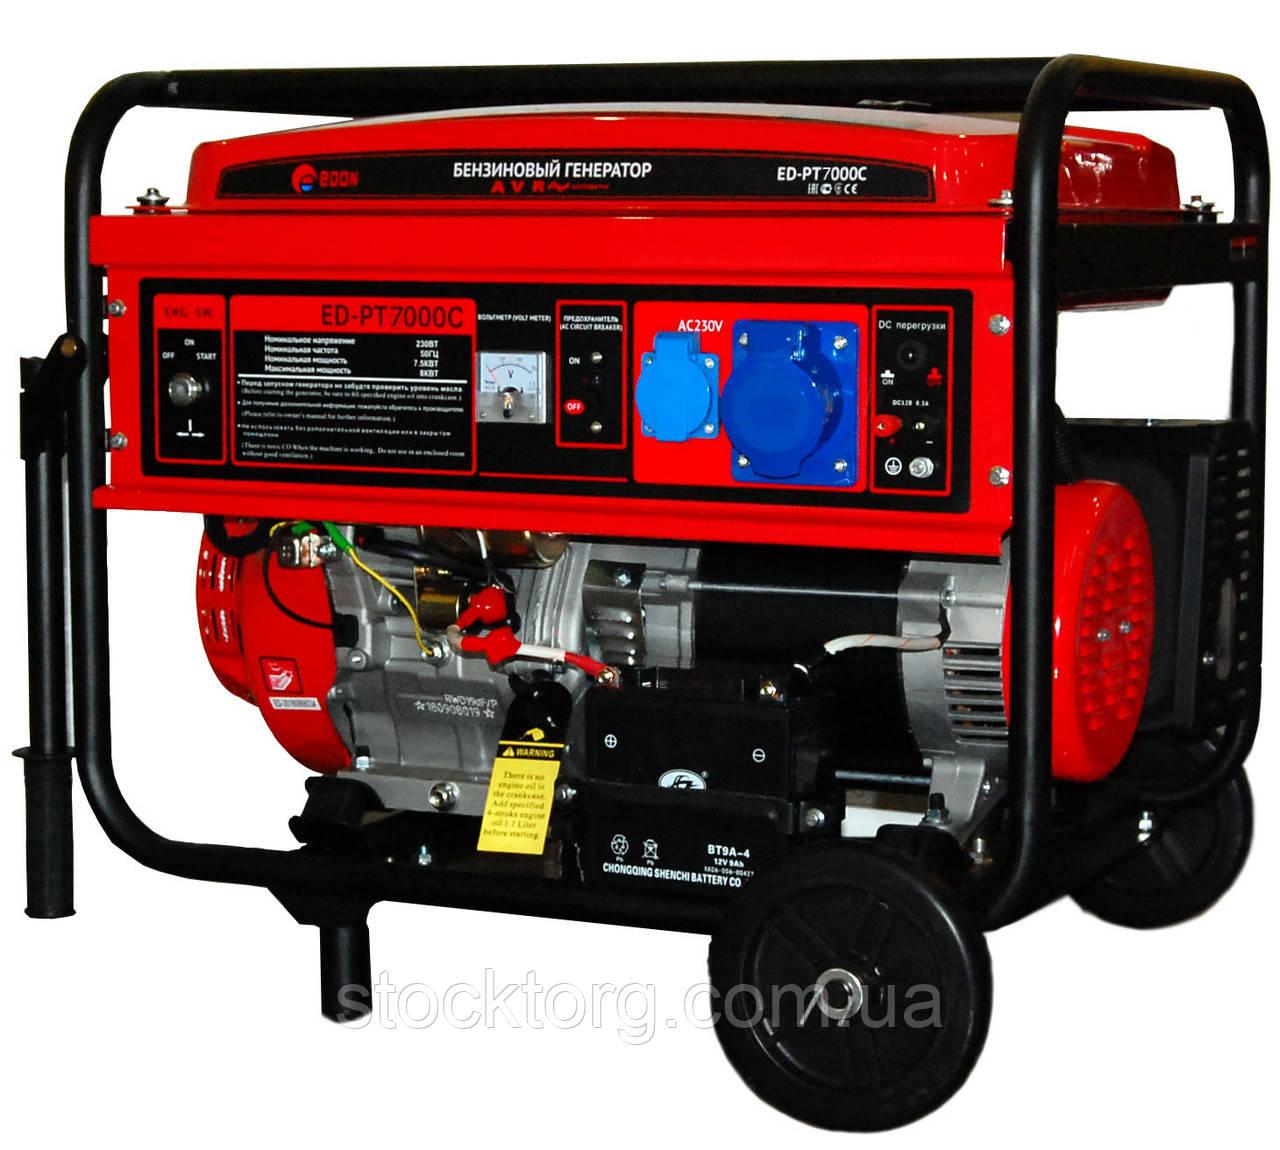 Генератор бензиновий Edon PT 7000C